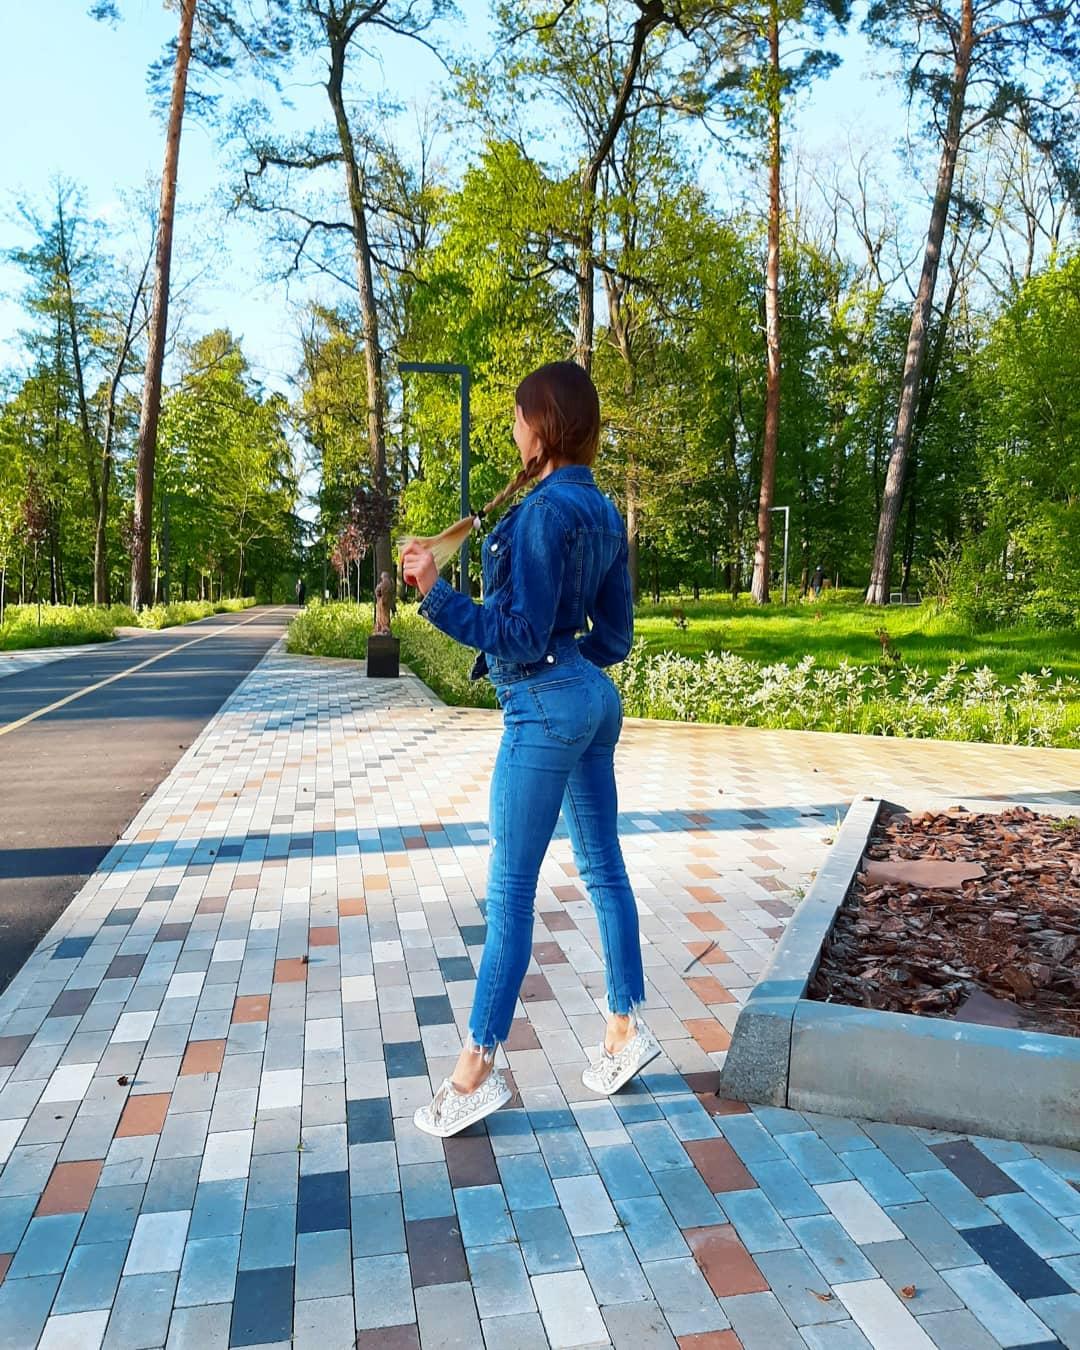 Alinka-Vladimirova-Wallpapers-Insta-Fit-Bio-8